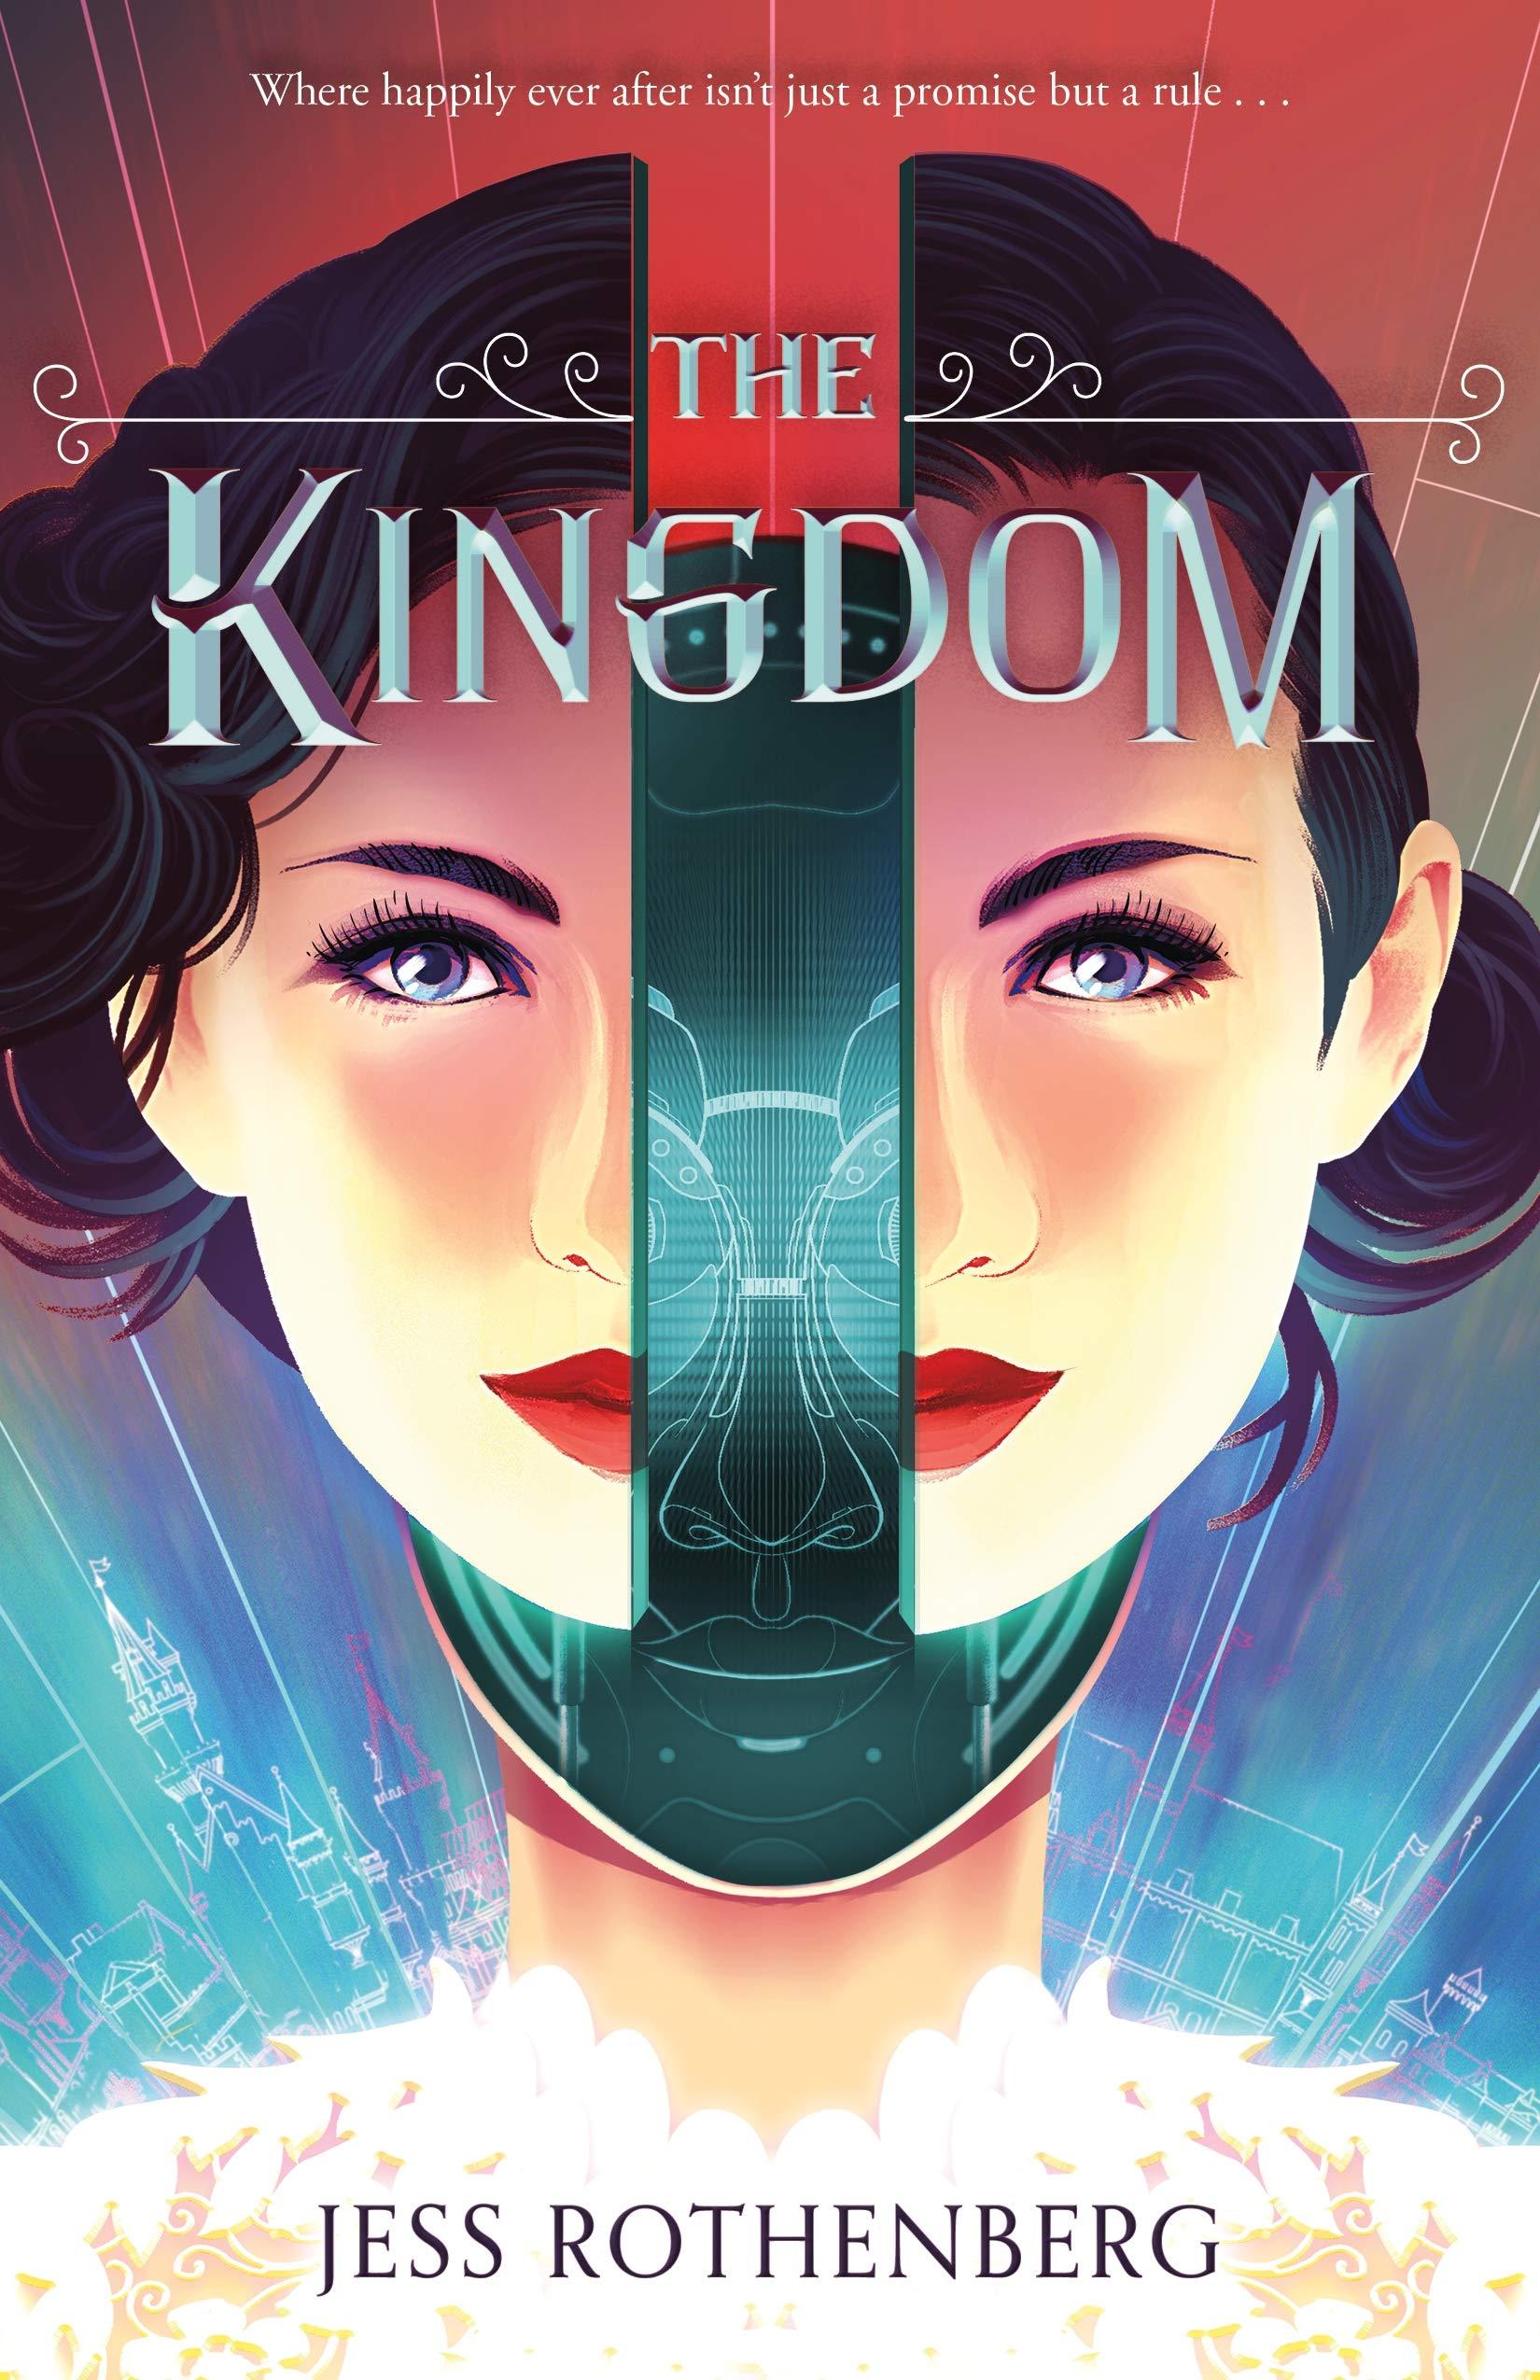 KINGDOM: Amazon.es: Rothenberg, Jess: Libros en idiomas extranjeros